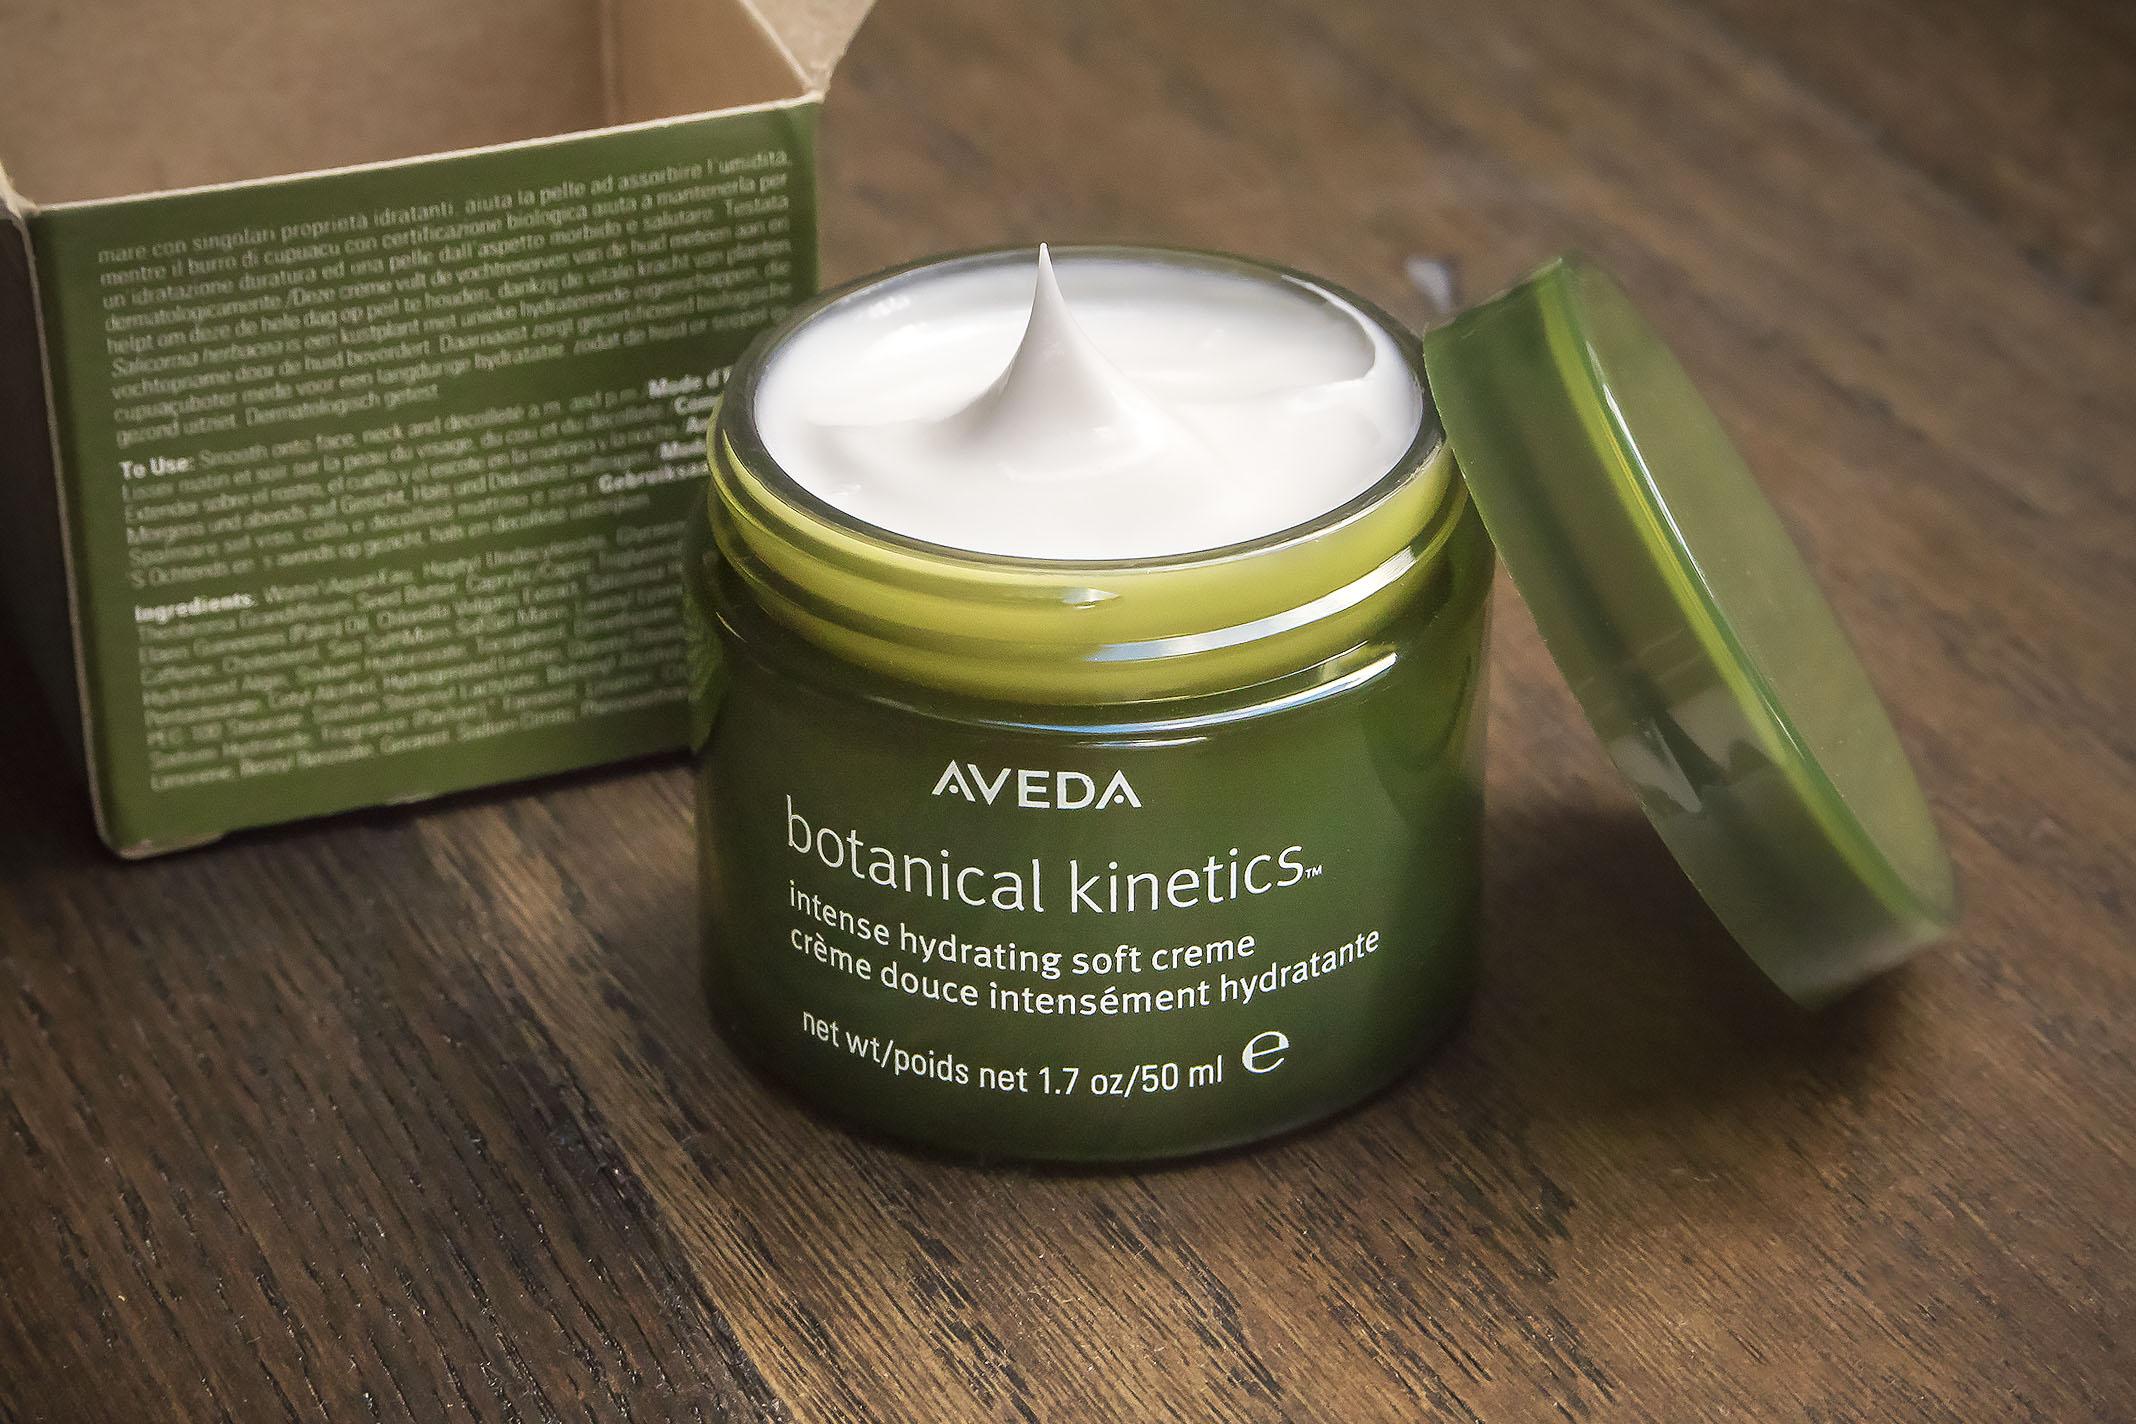 Aveda Botanical Kinetics Intense Hydrating Soft Creme Reviva Labs Lift And Firm Serum - 1 Oz, 3 Pack